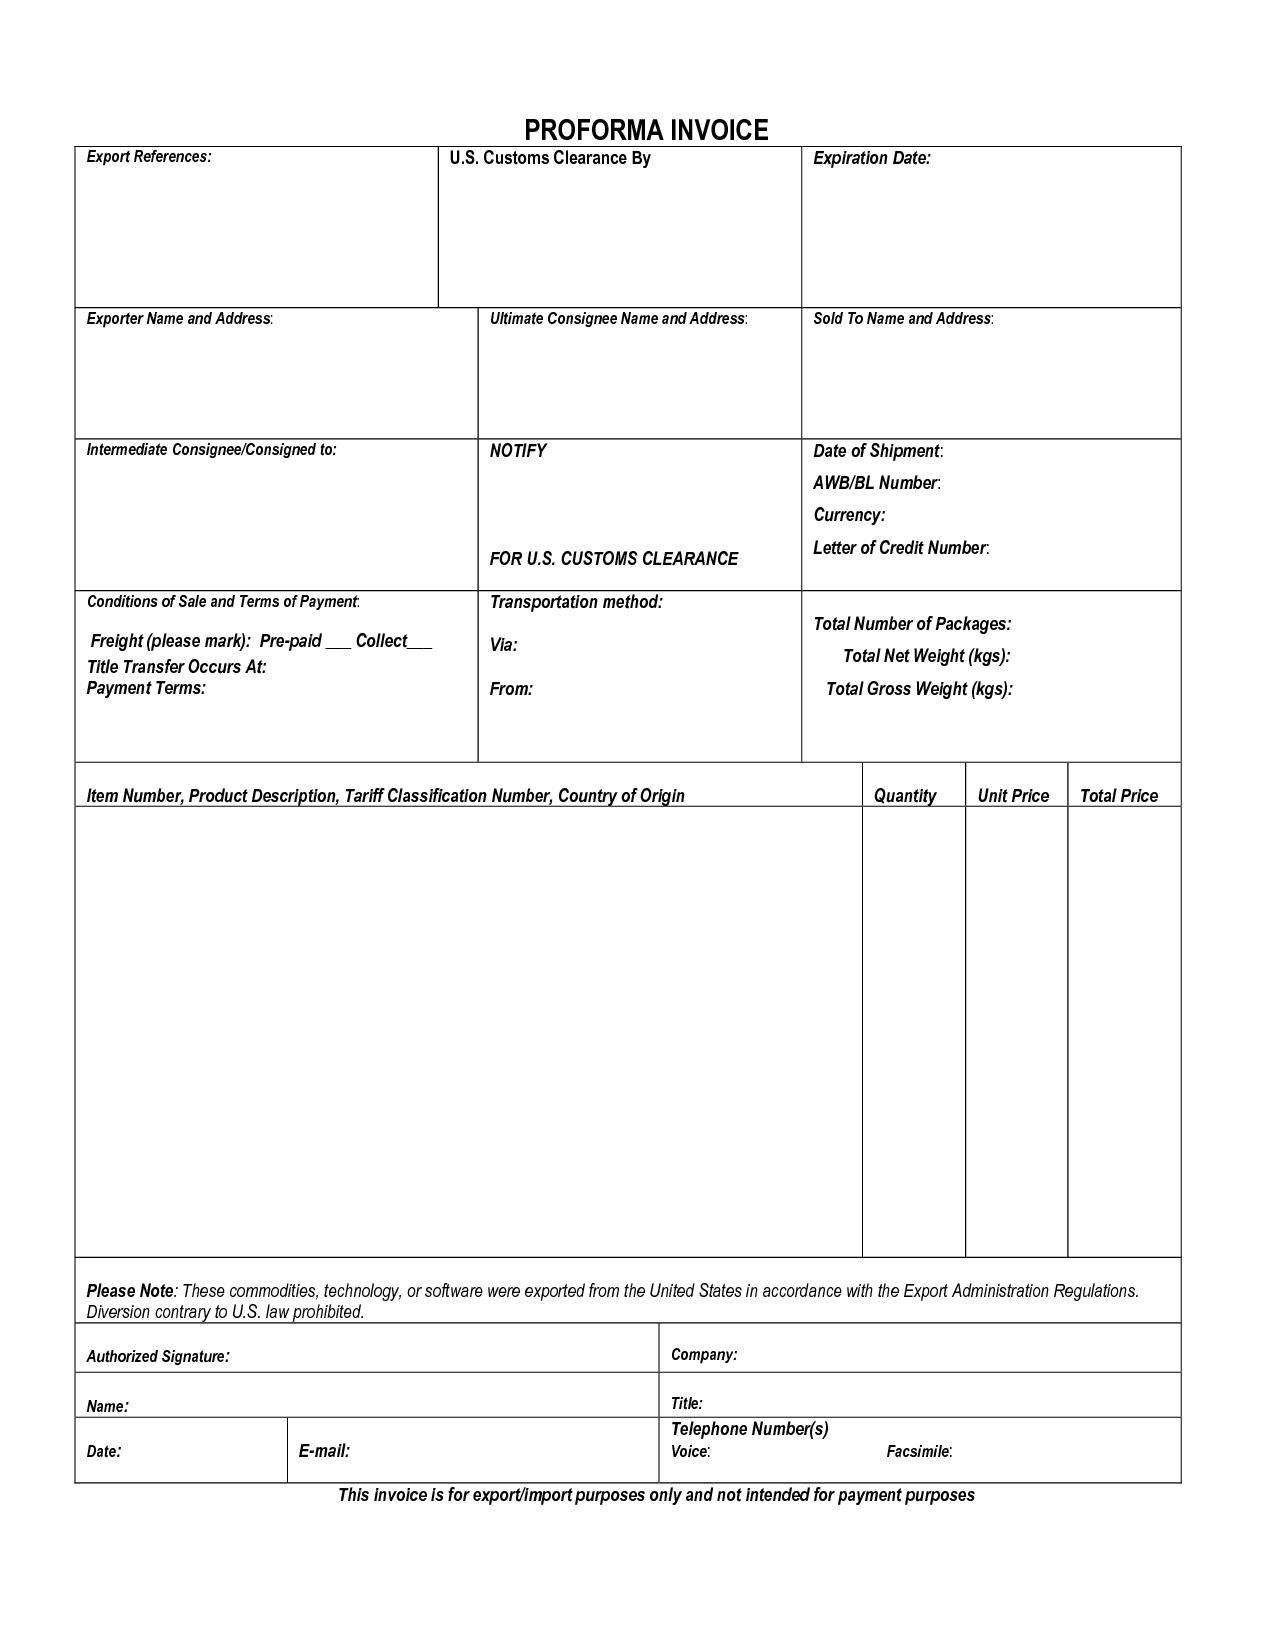 proforma invoice customs ideas resume example ideas curriculum proforma invoice for customs